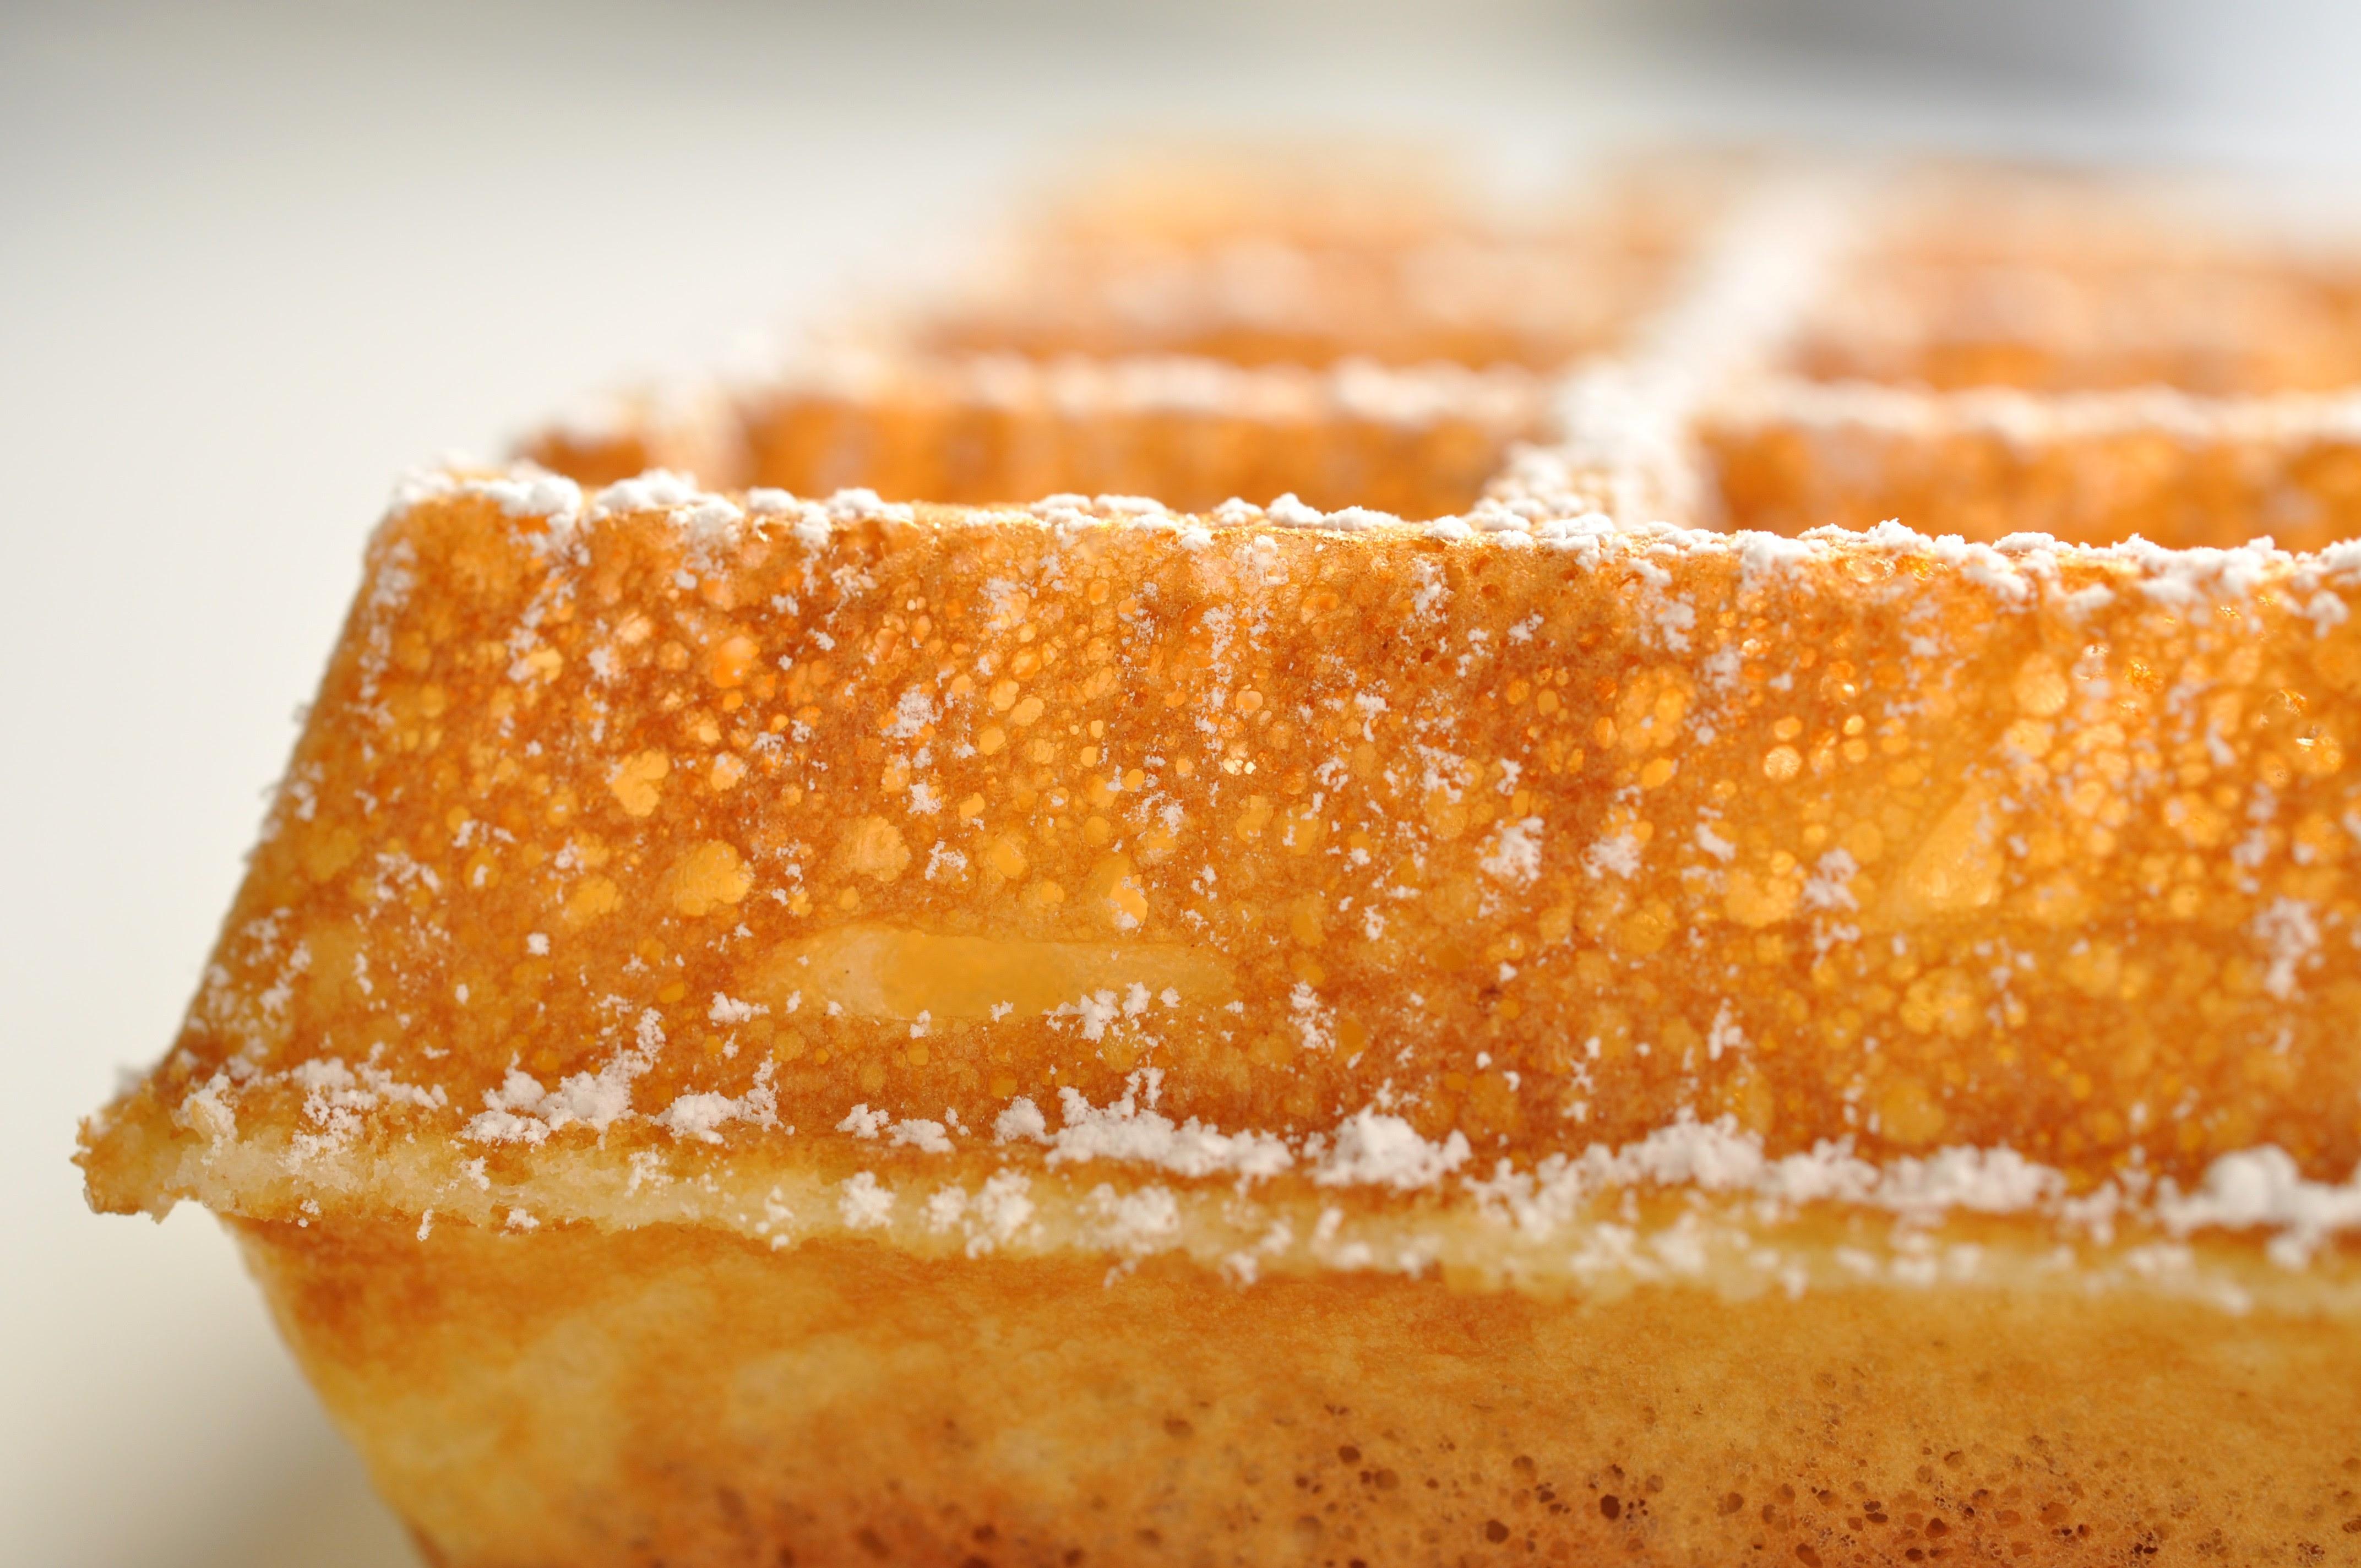 Belgian Waffle Recipe | Pastry Chef - Author Eddy Van Damme